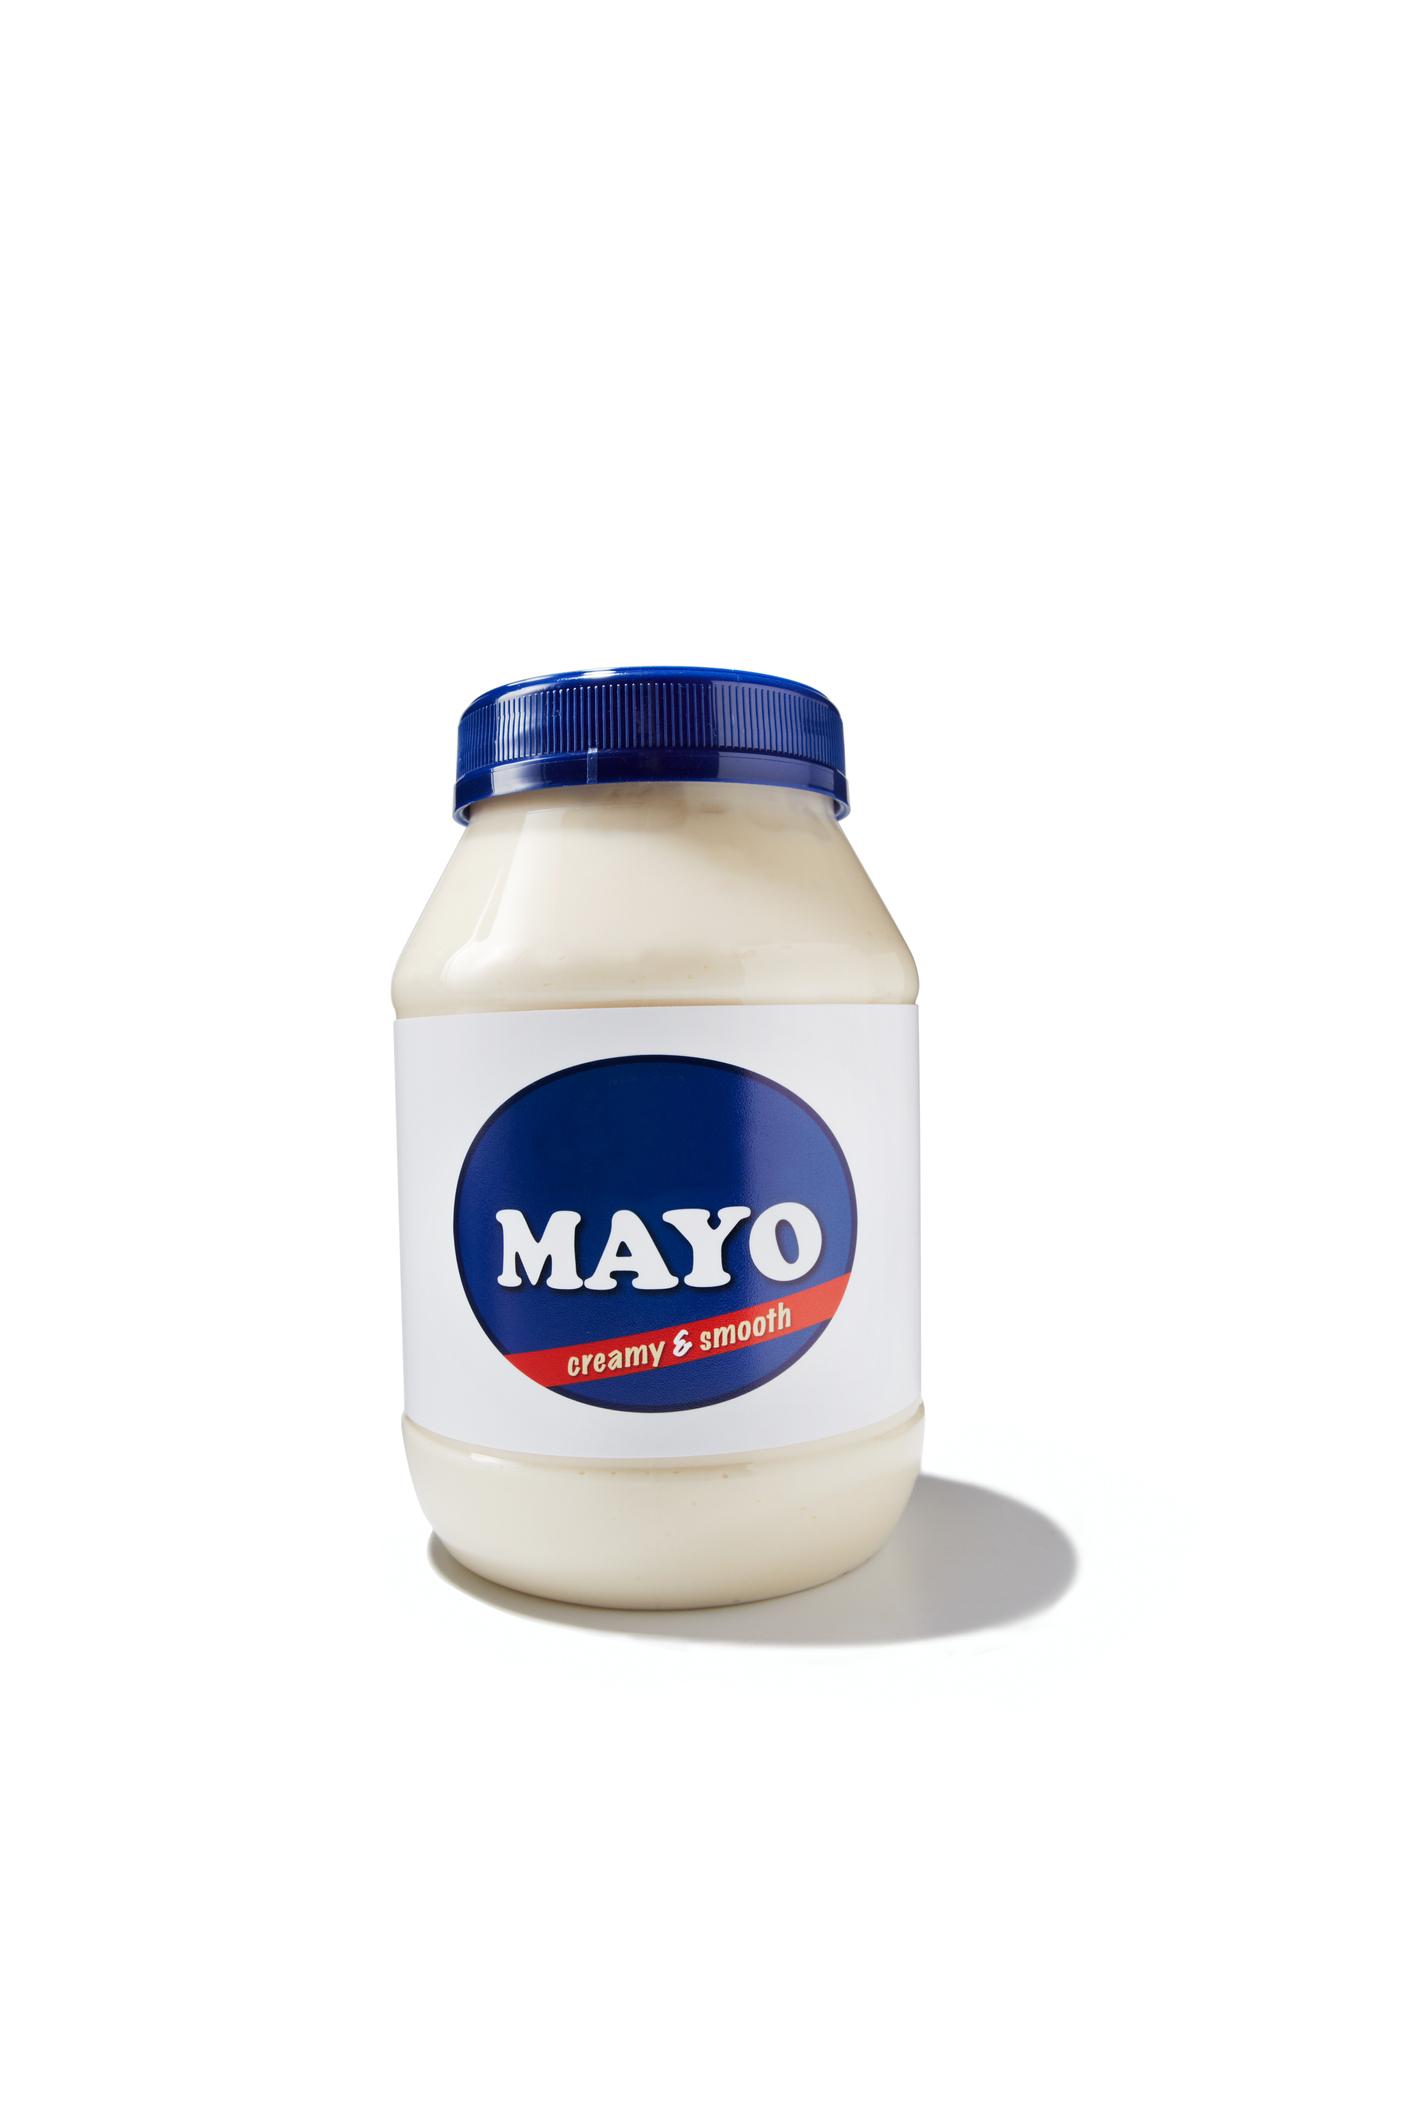 Jar of Mayo